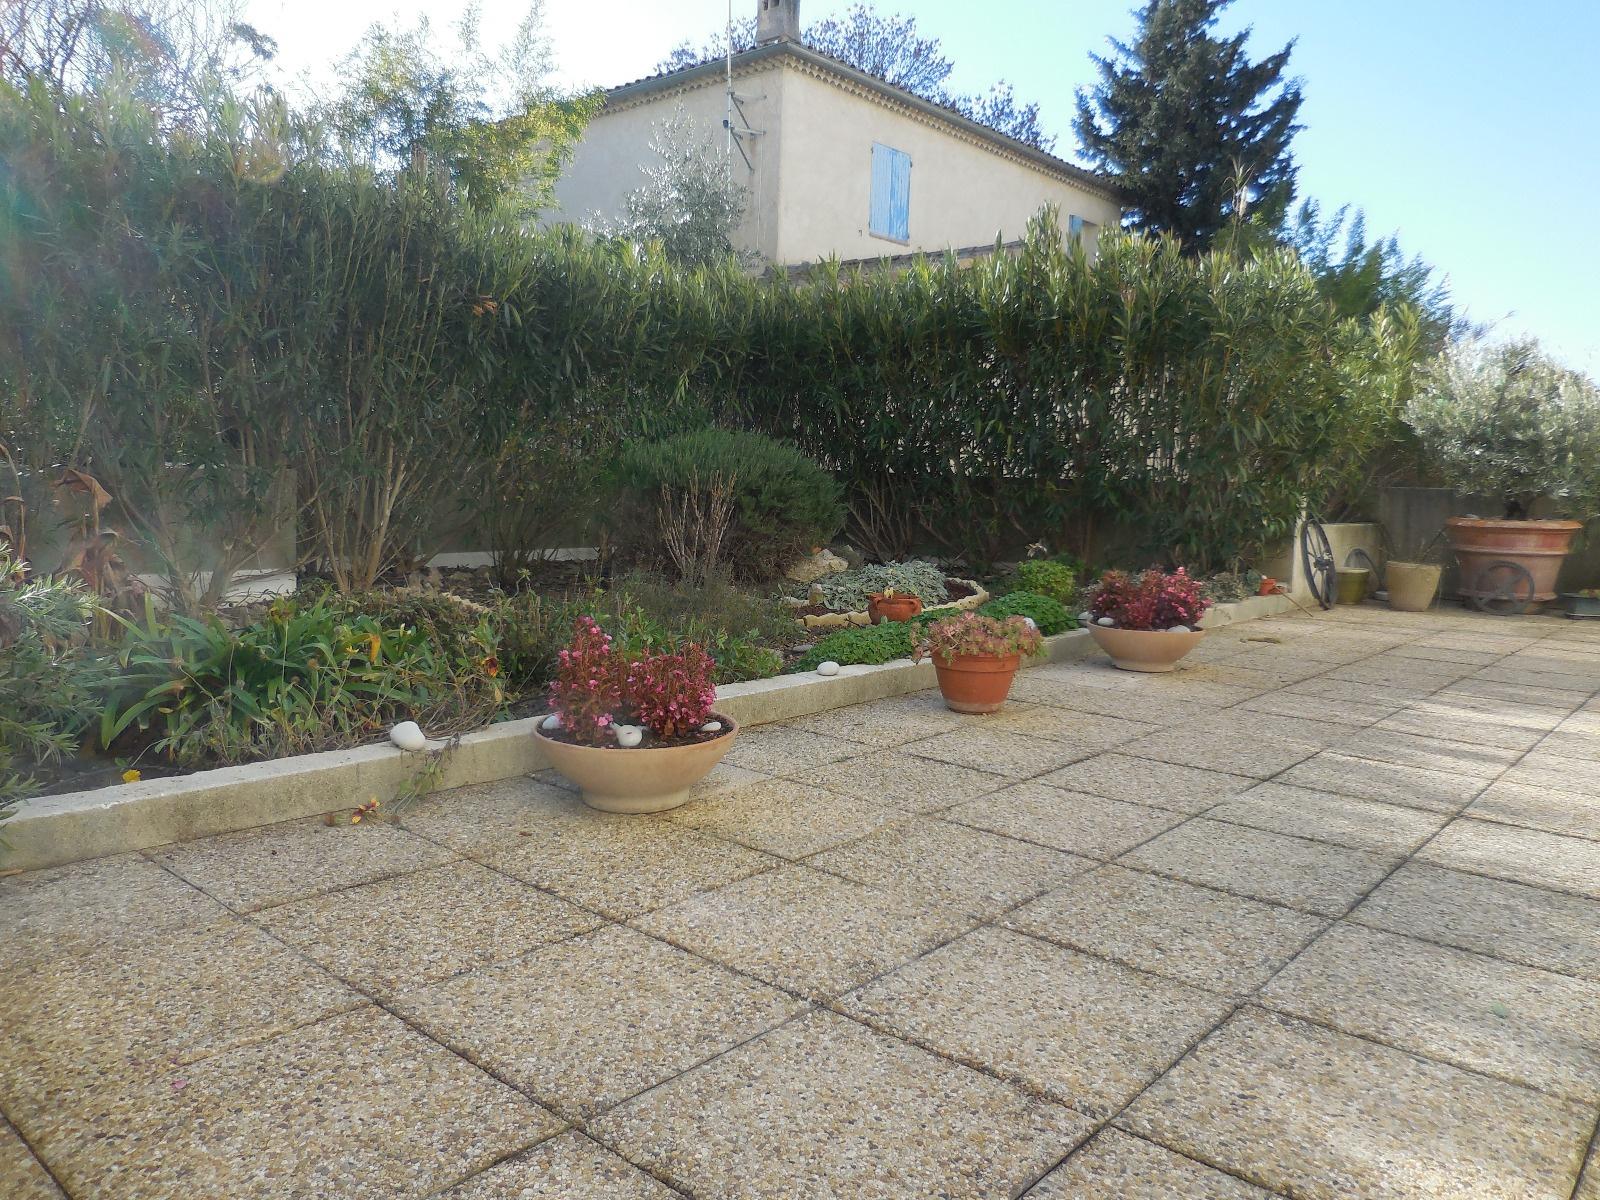 Vente appartement de t3 avec grande terrasse jardin azur for Jardin terrasse appartement